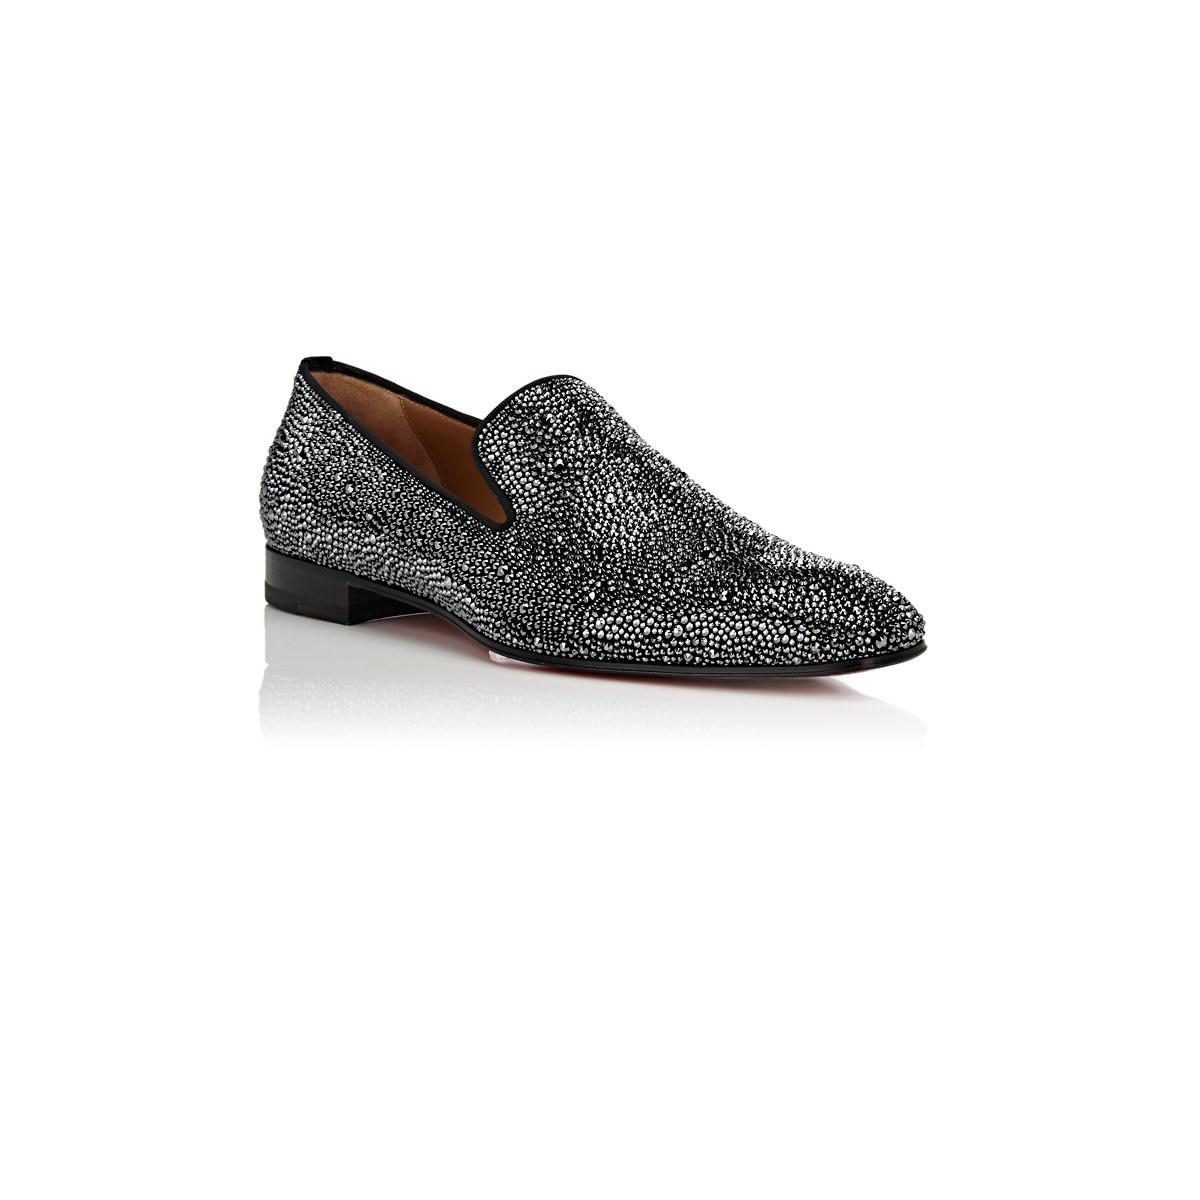 129879b03041 Christian Louboutin - Gray Dandelion Strass Suede Venetian Loafers for Men  - Lyst. View fullscreen